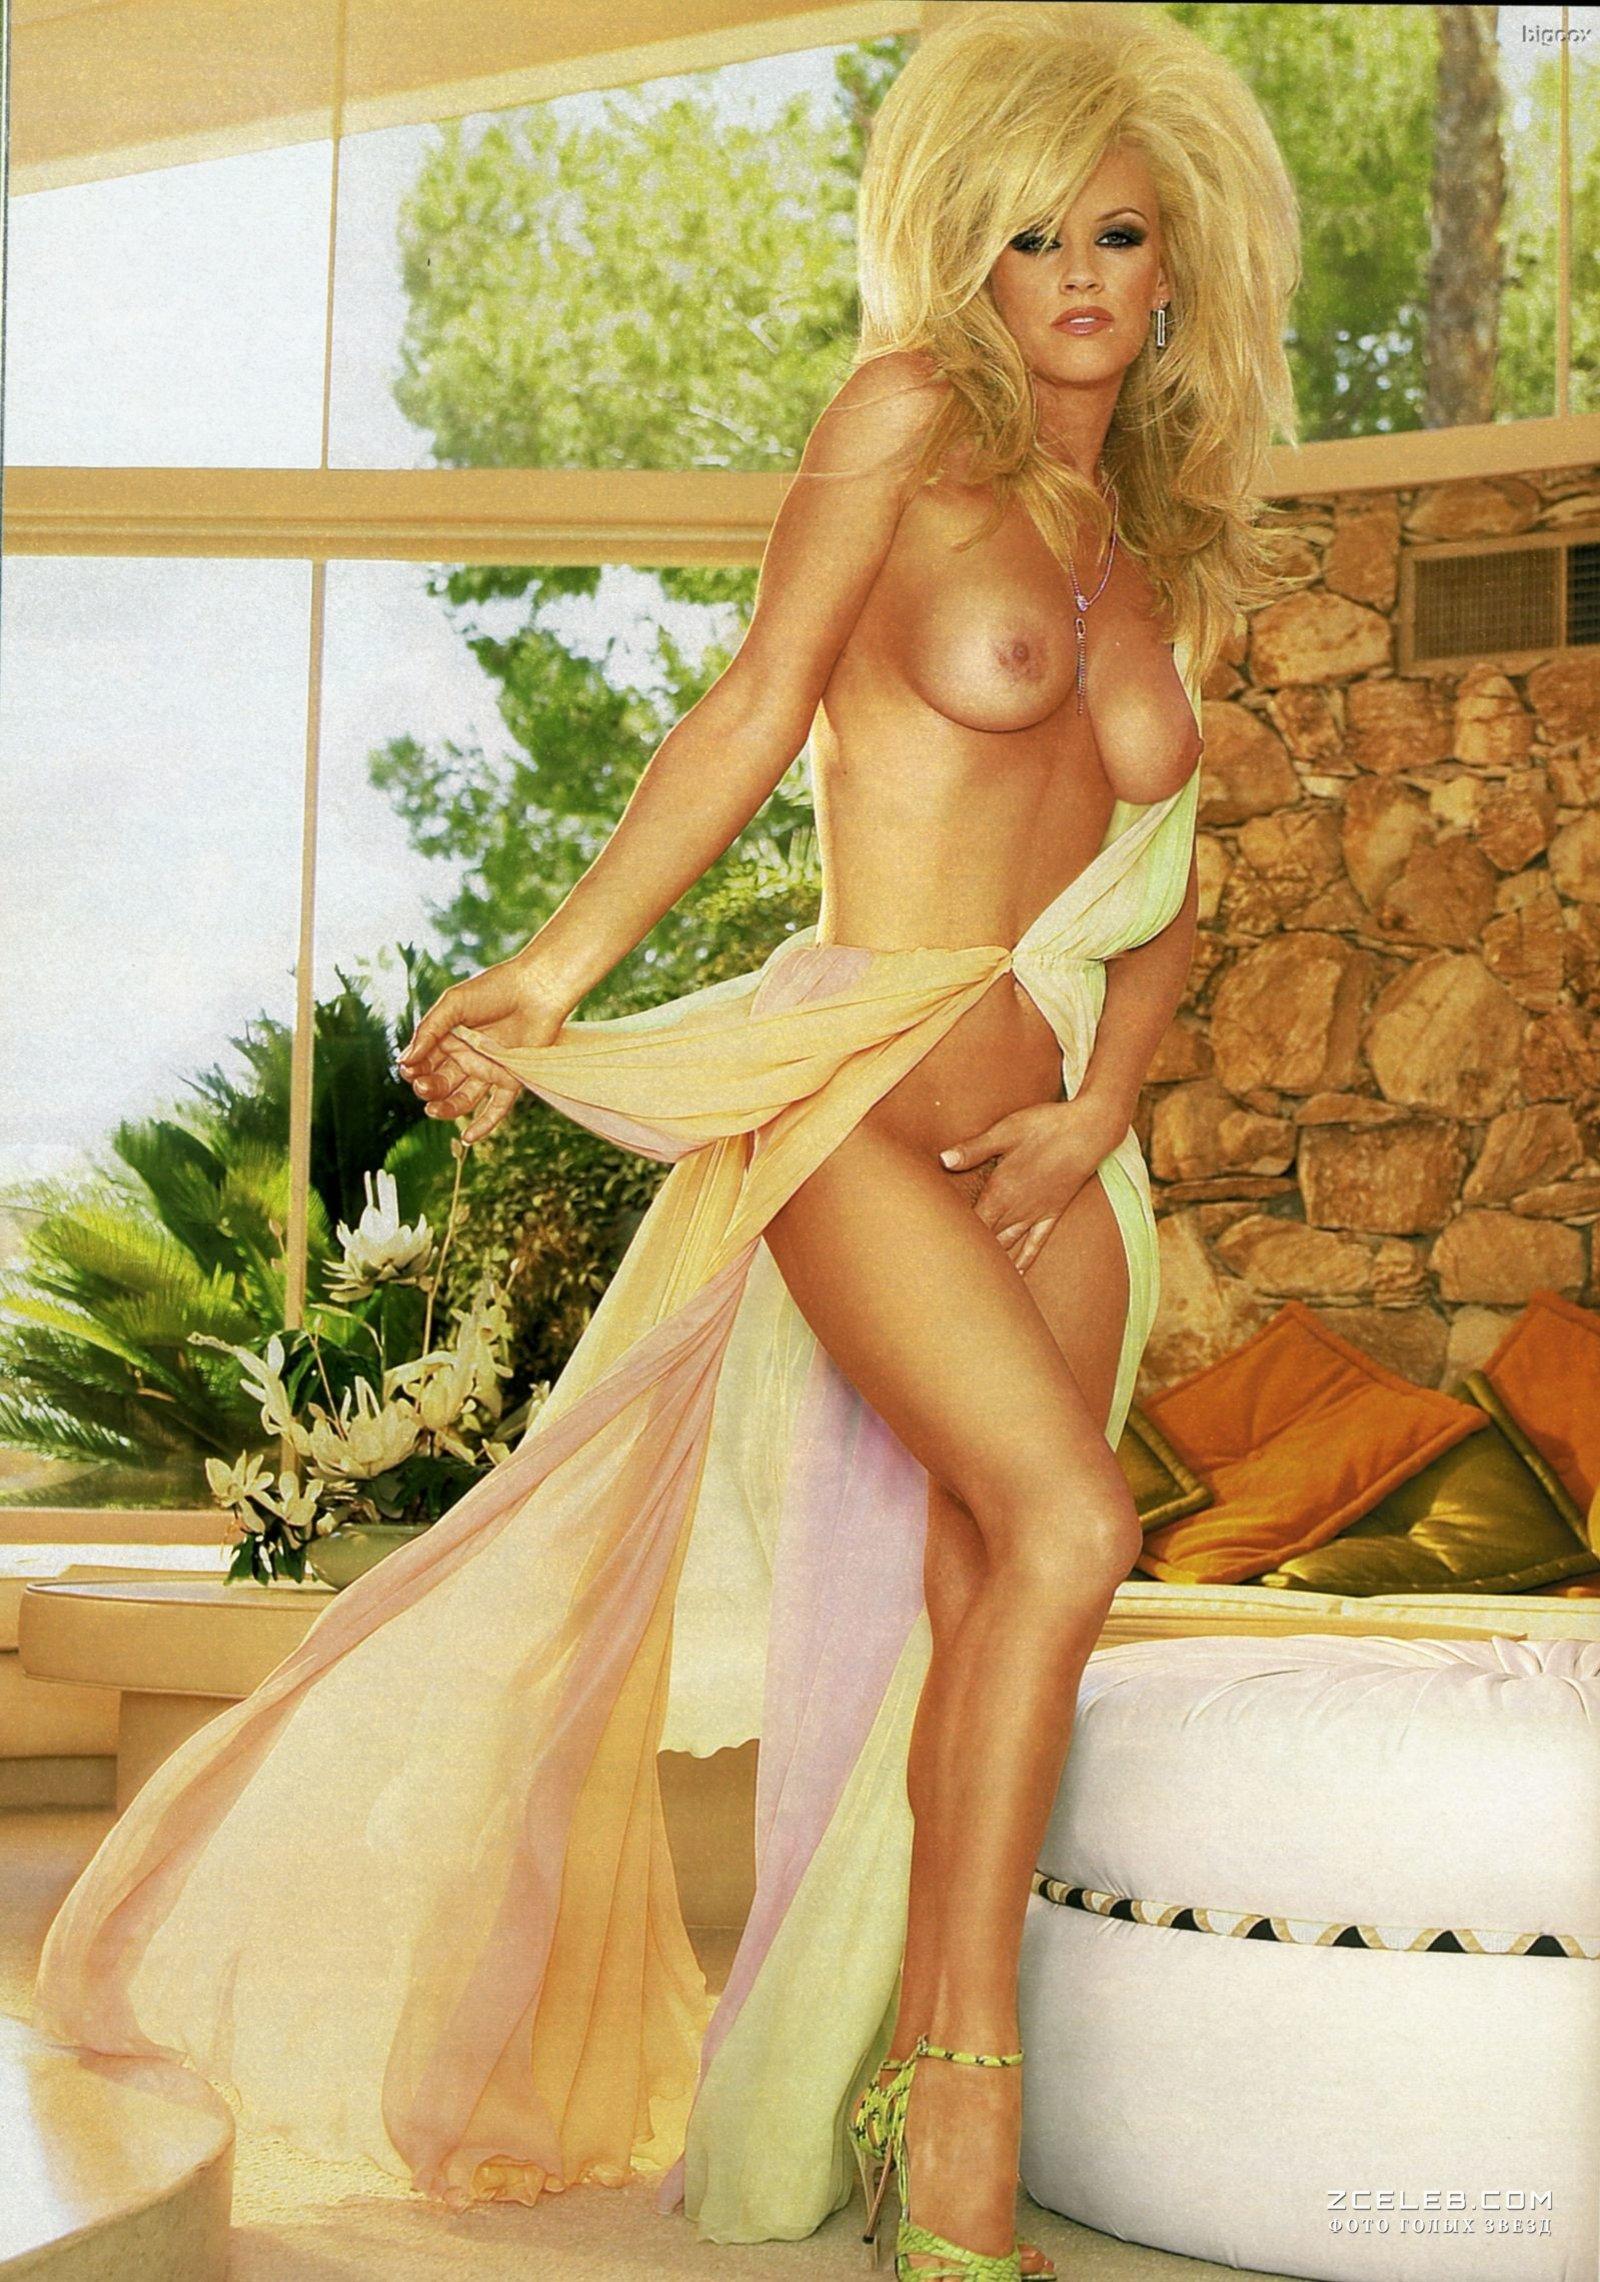 Porn jenny mccarthy nude